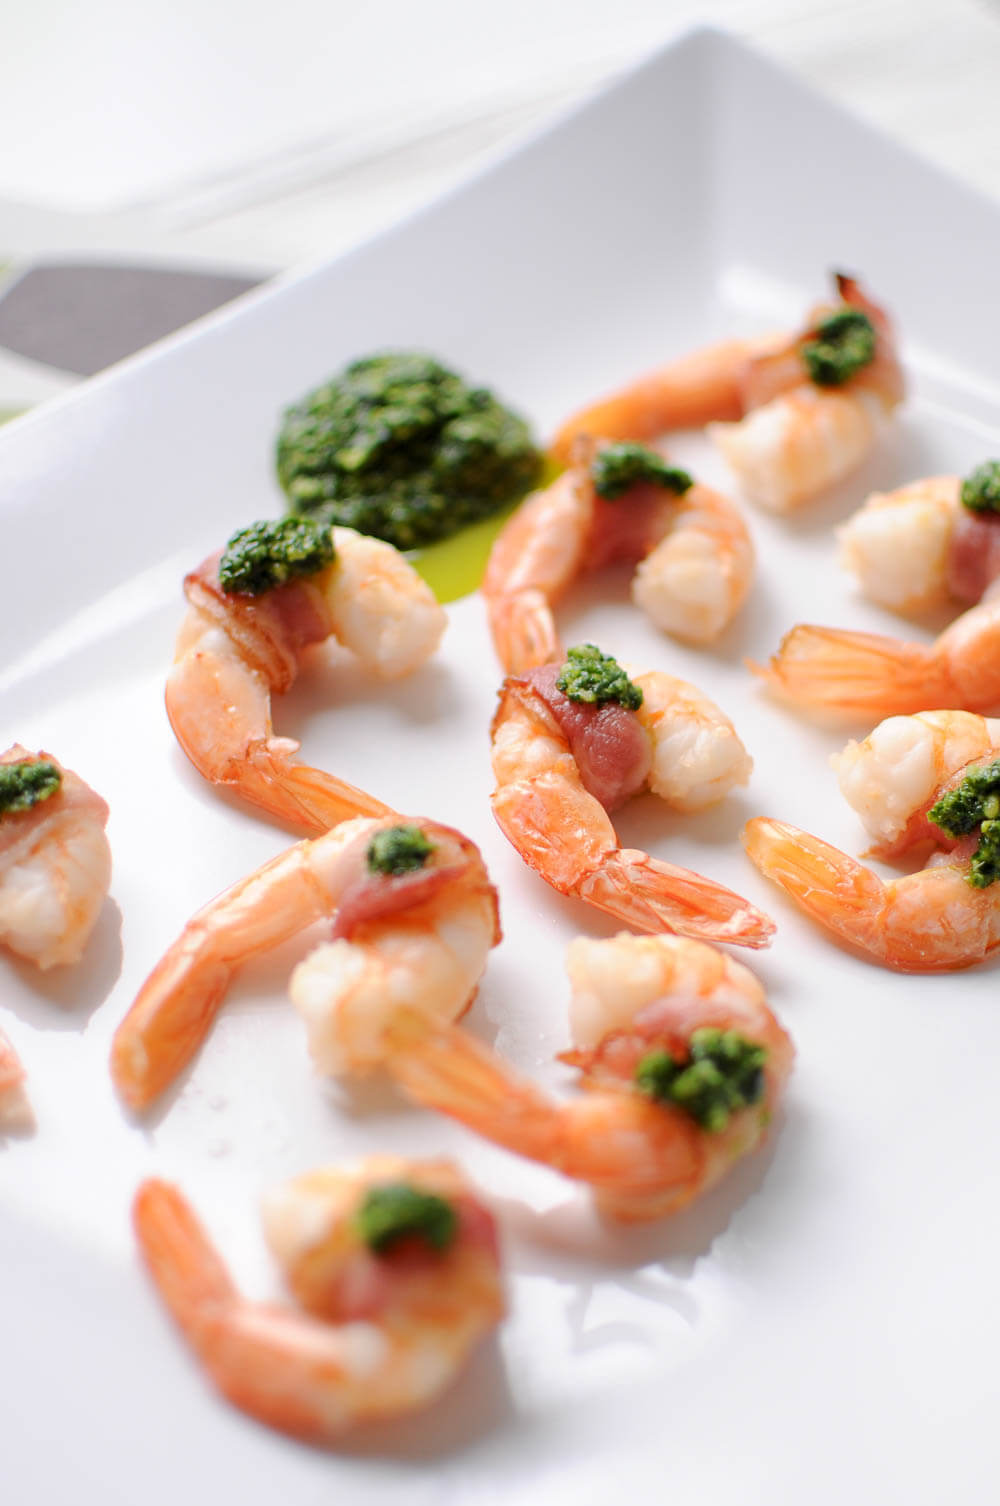 Bacon-Wrapped Shrimp with Pesto-7